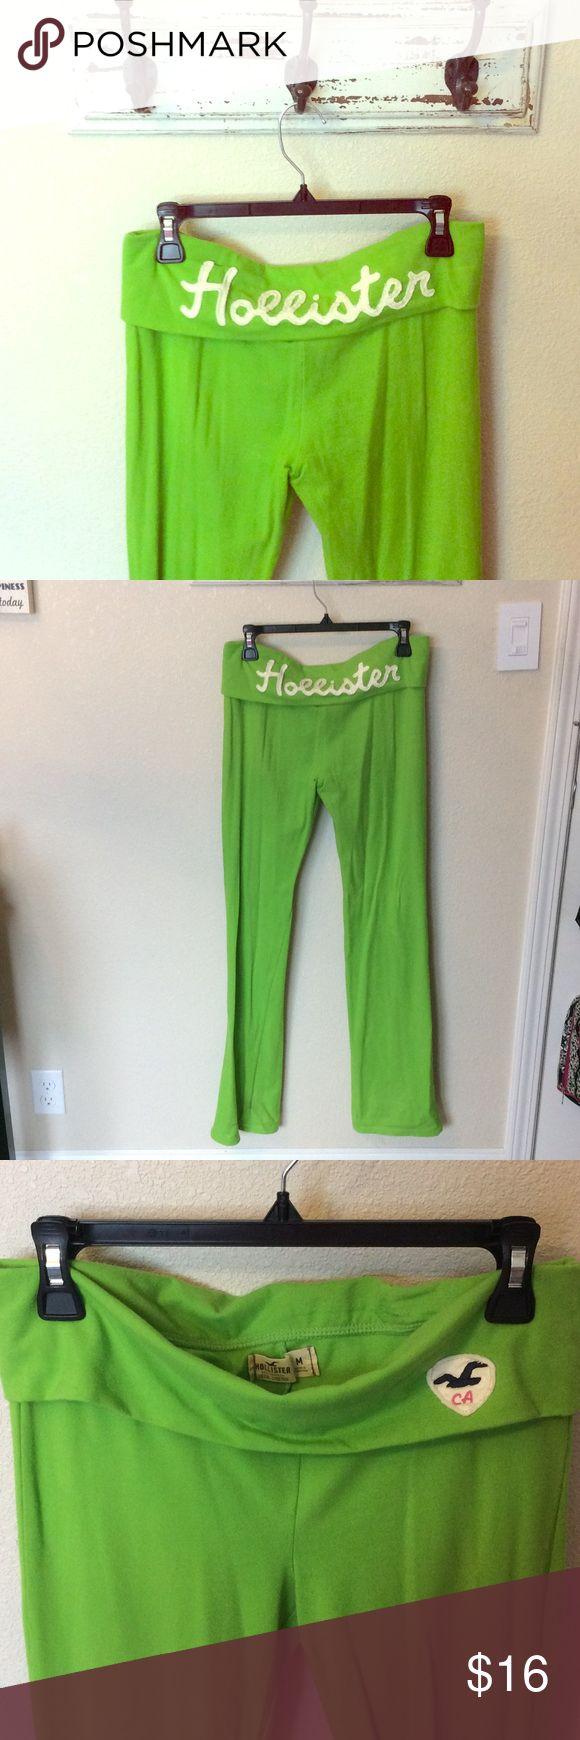 Workout pants, leggings Hollister legging style pants Hollister Pants Track Pants & Joggers